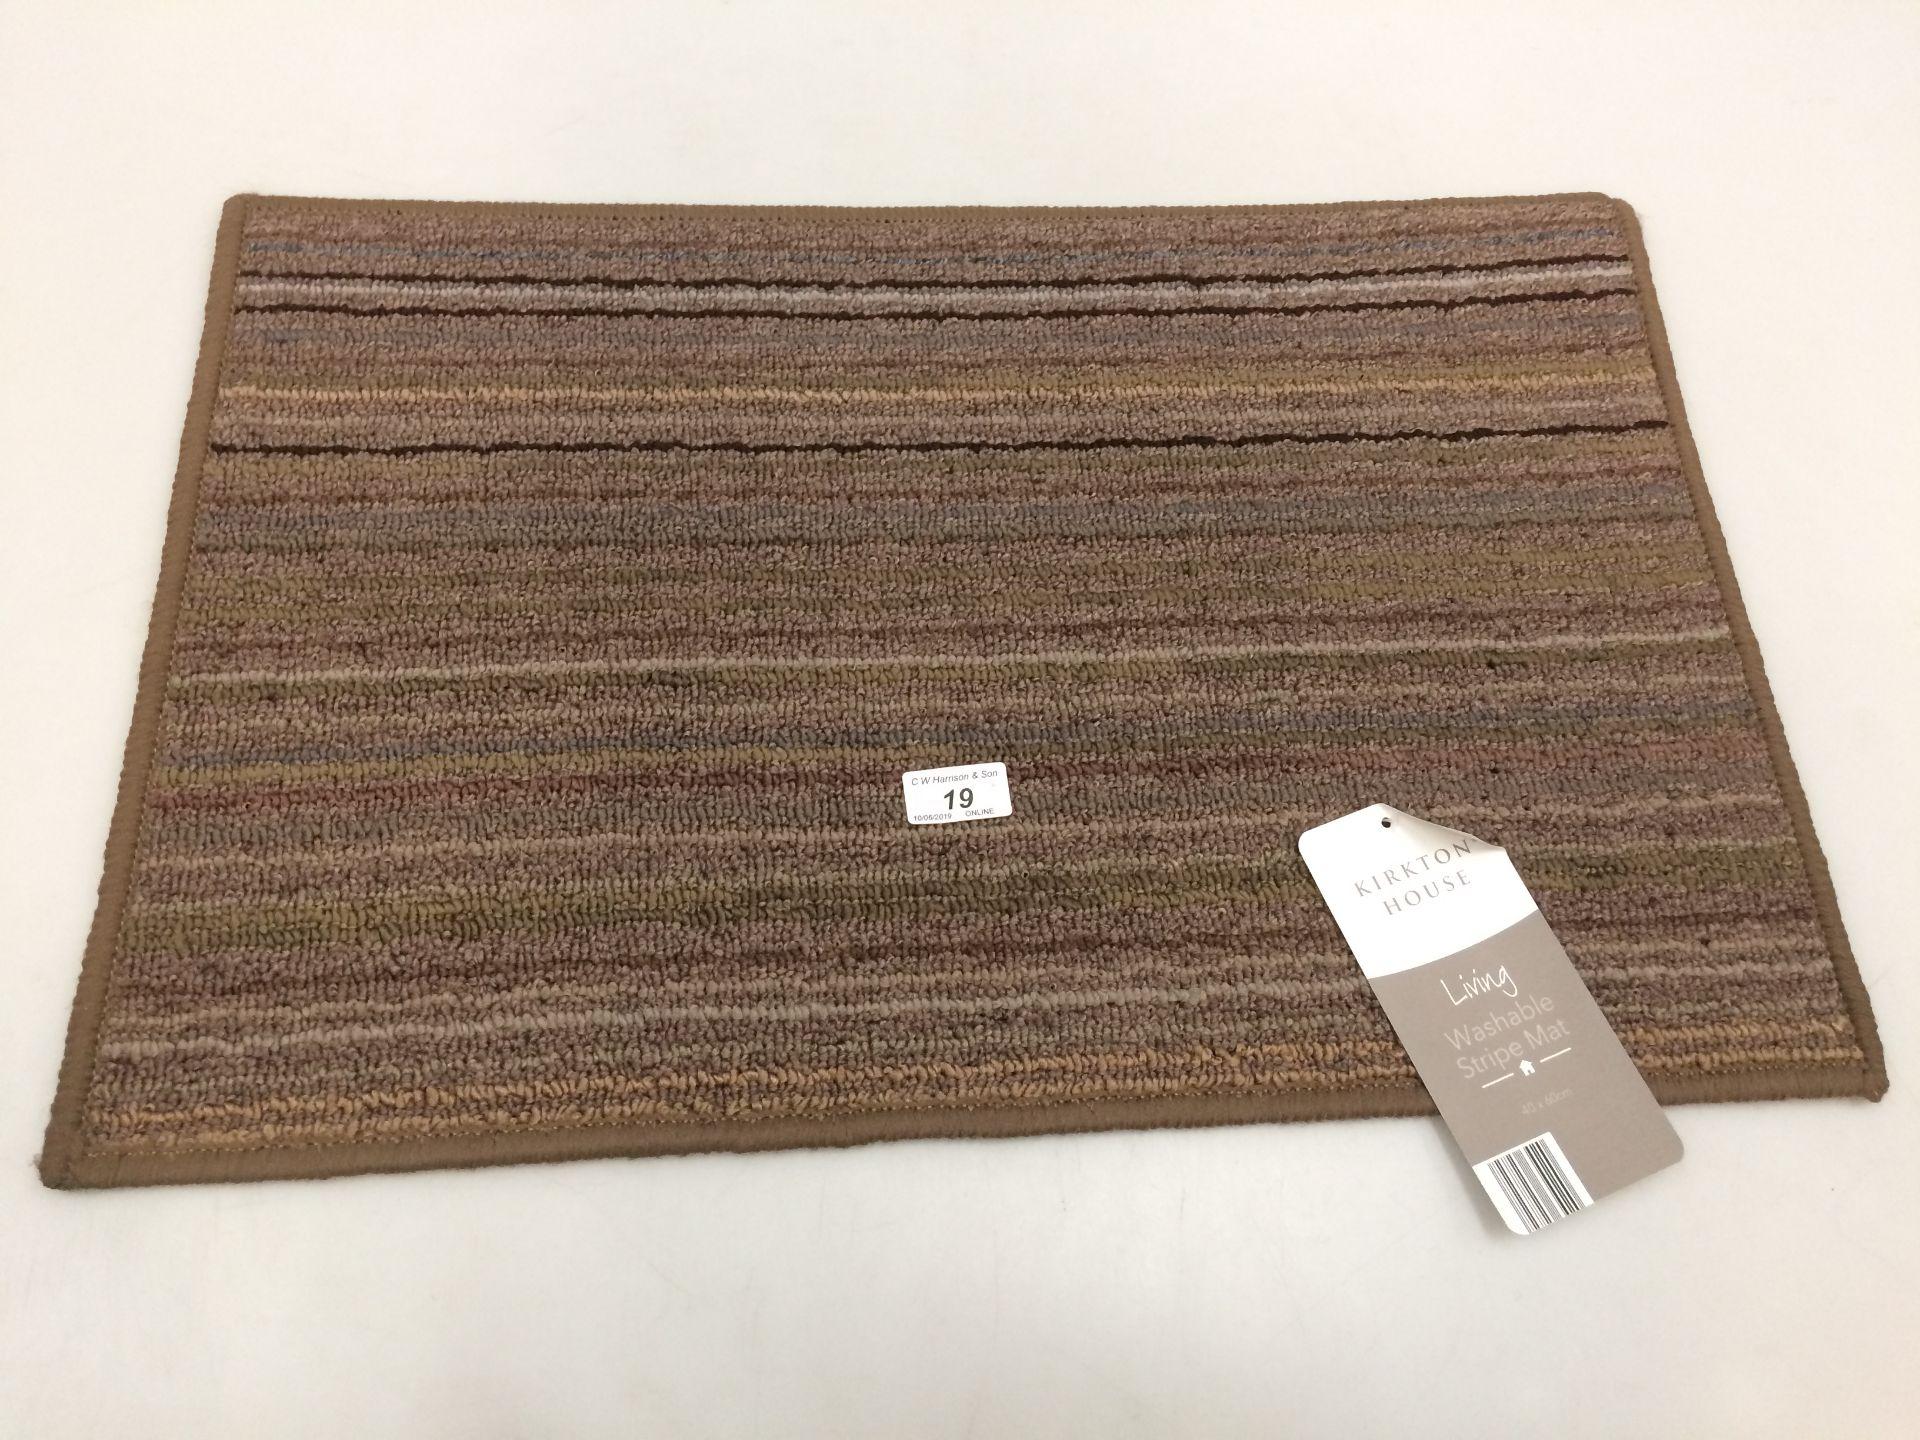 Lot 19 - 10 x Kirkton House brown multi striped washable door mats each 40 x 60cm